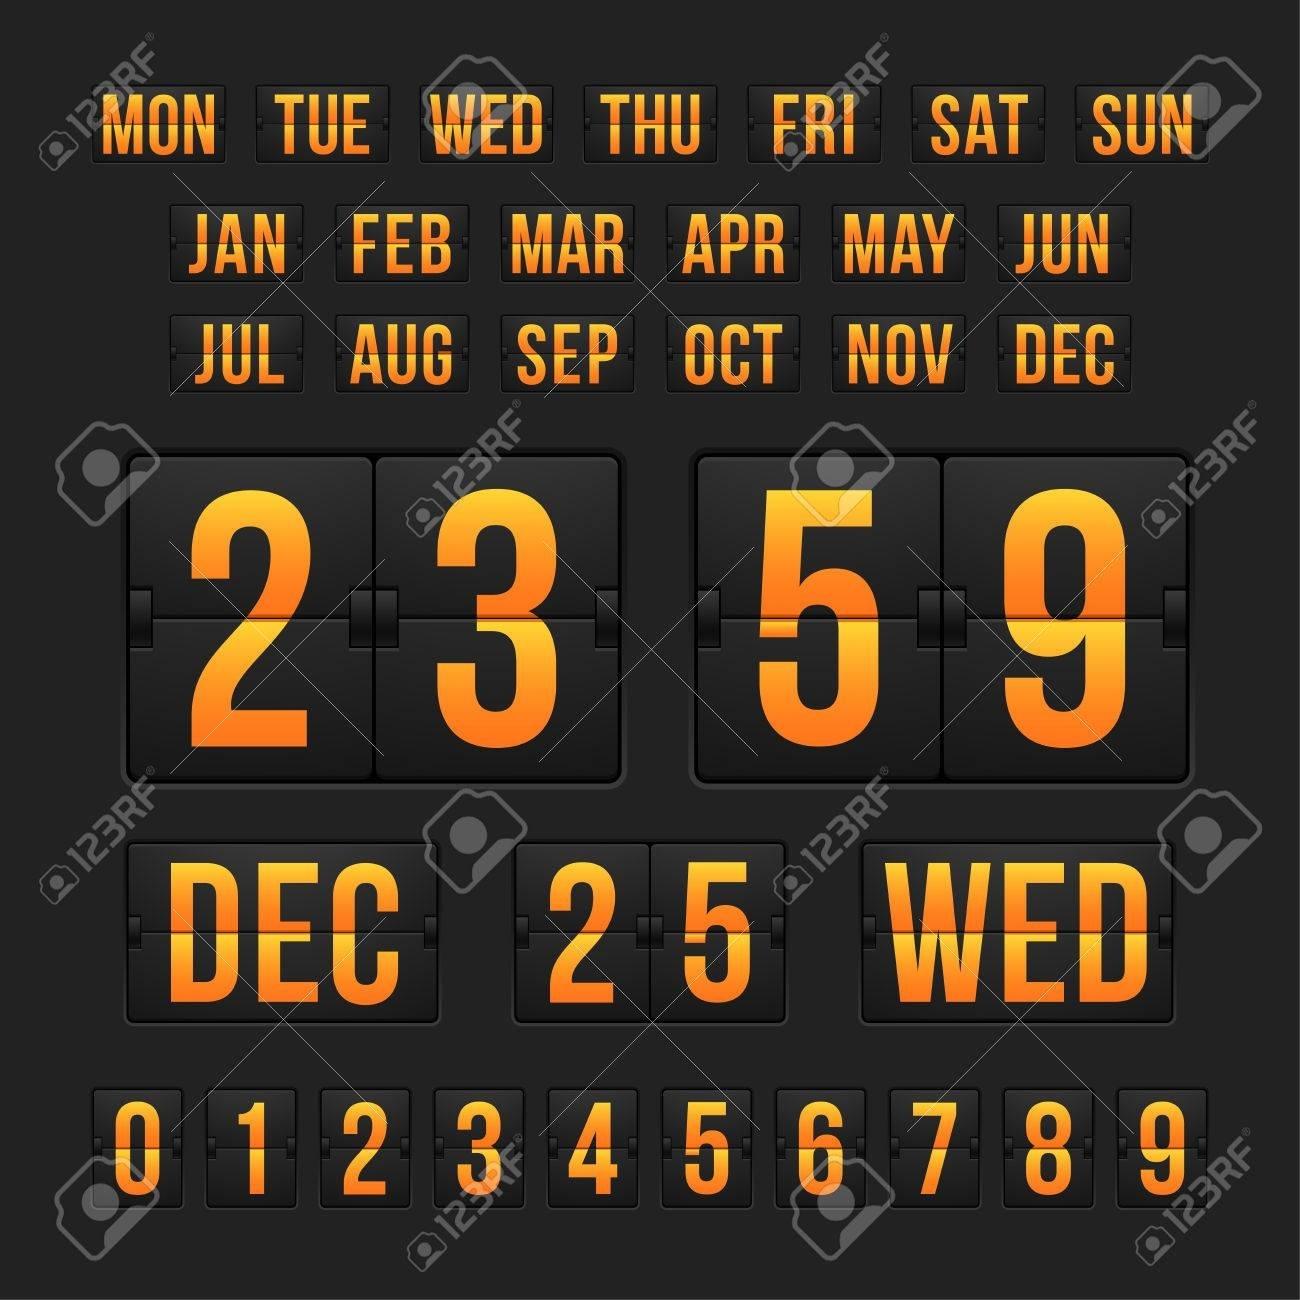 Countdown Timer And Date, Calendar Scoreboard_Calendar Countdown Between Dates